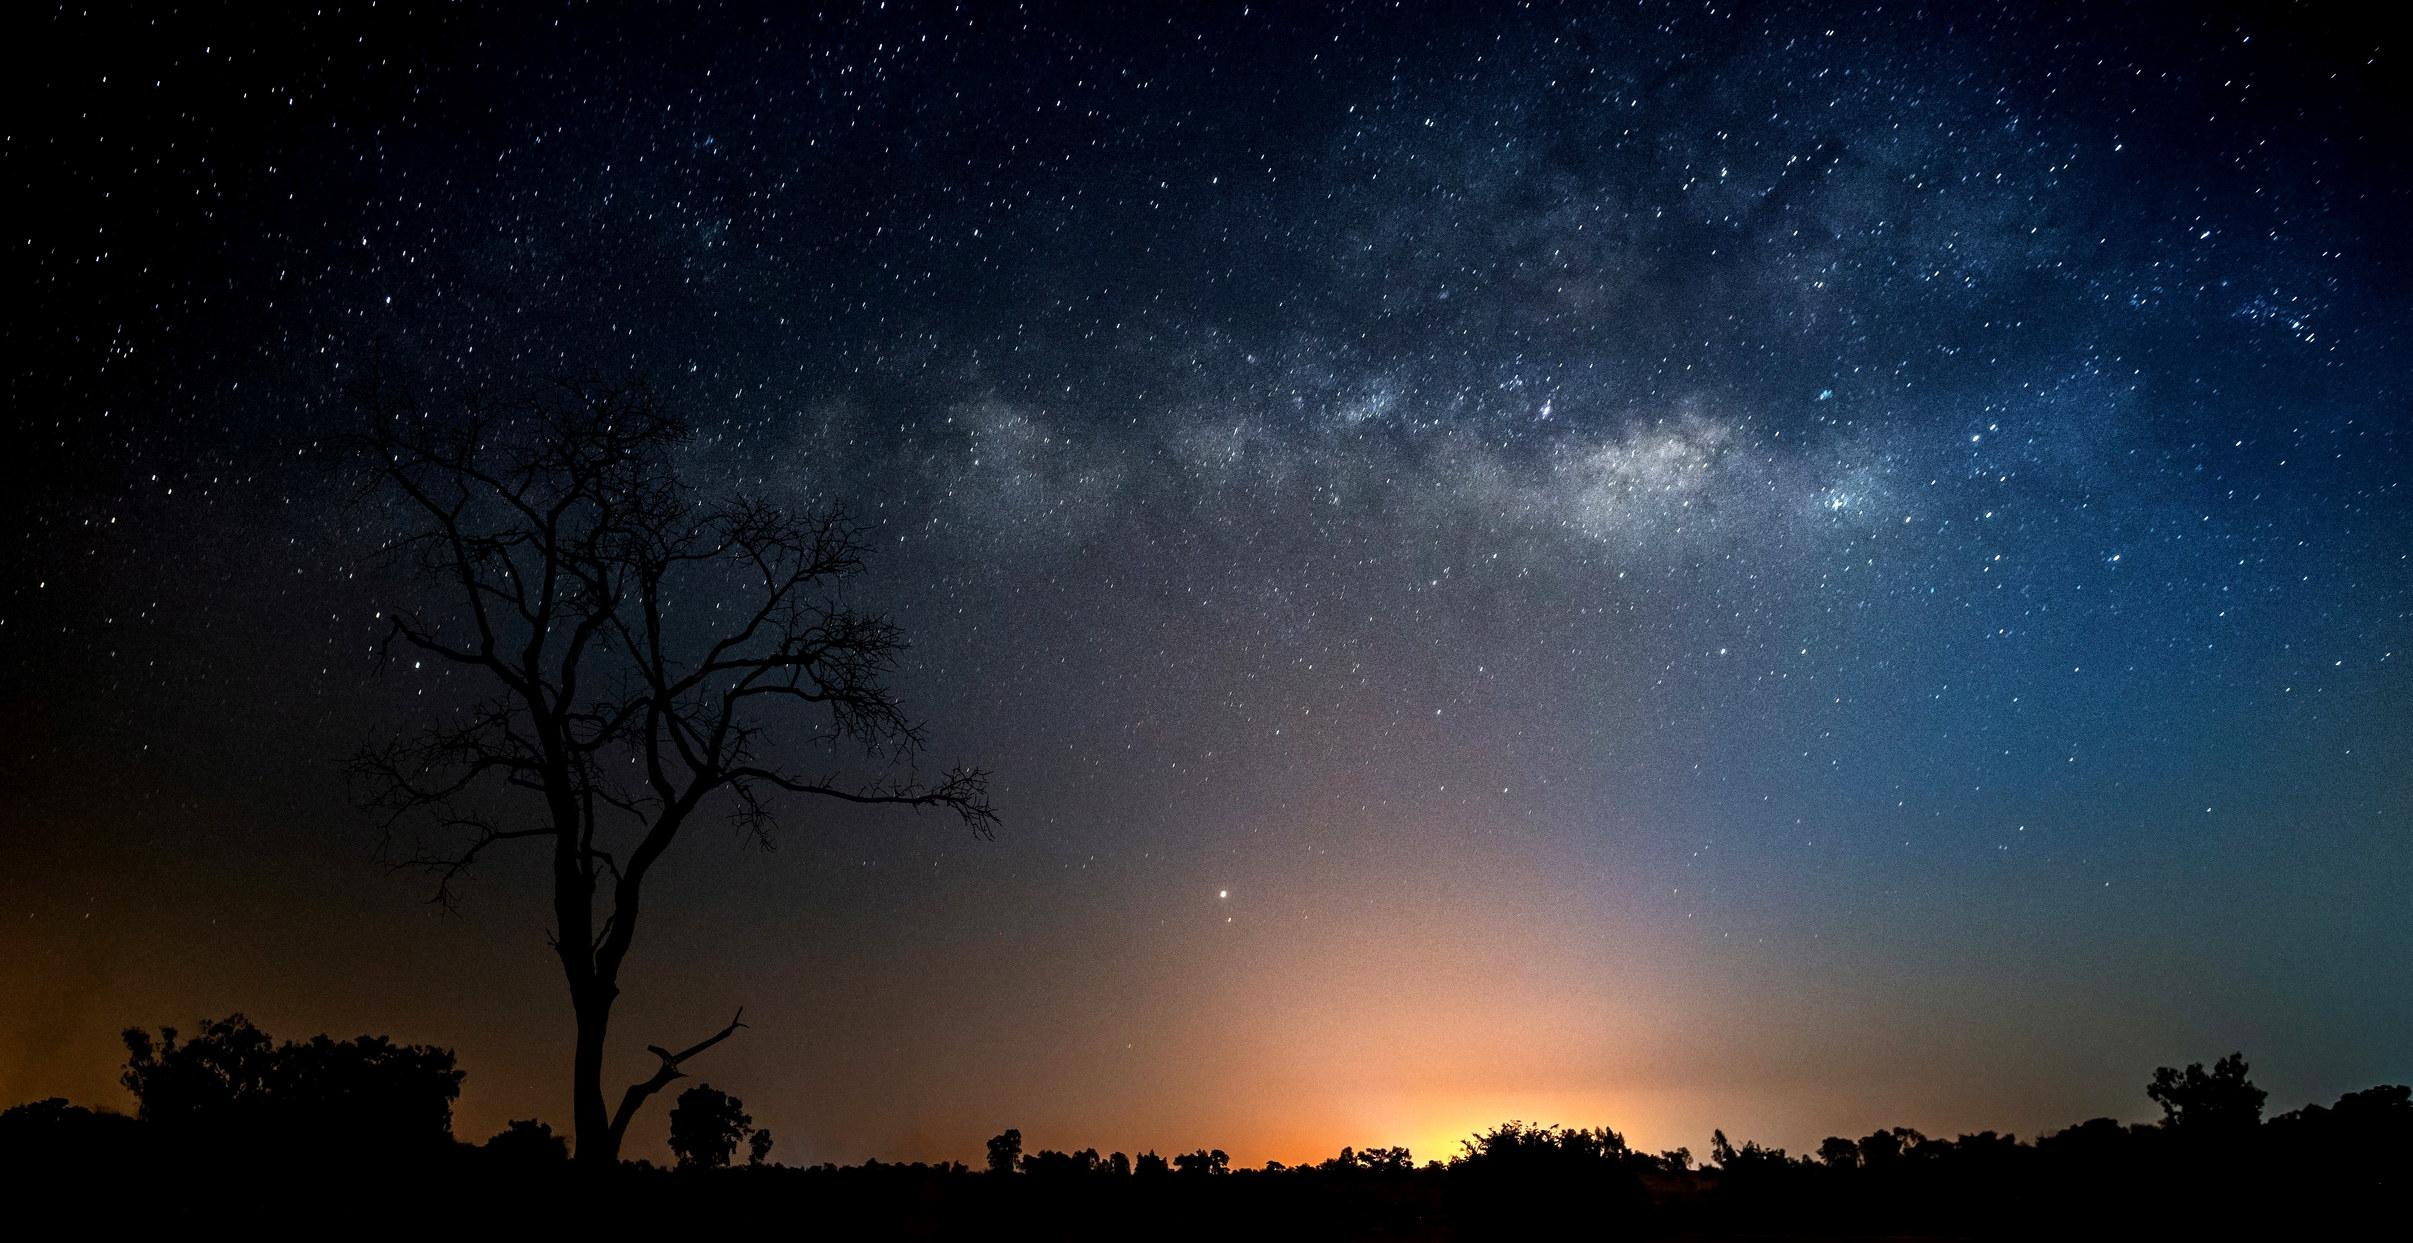 stars shine in a the night sky as the sun tucks beneath the horizon